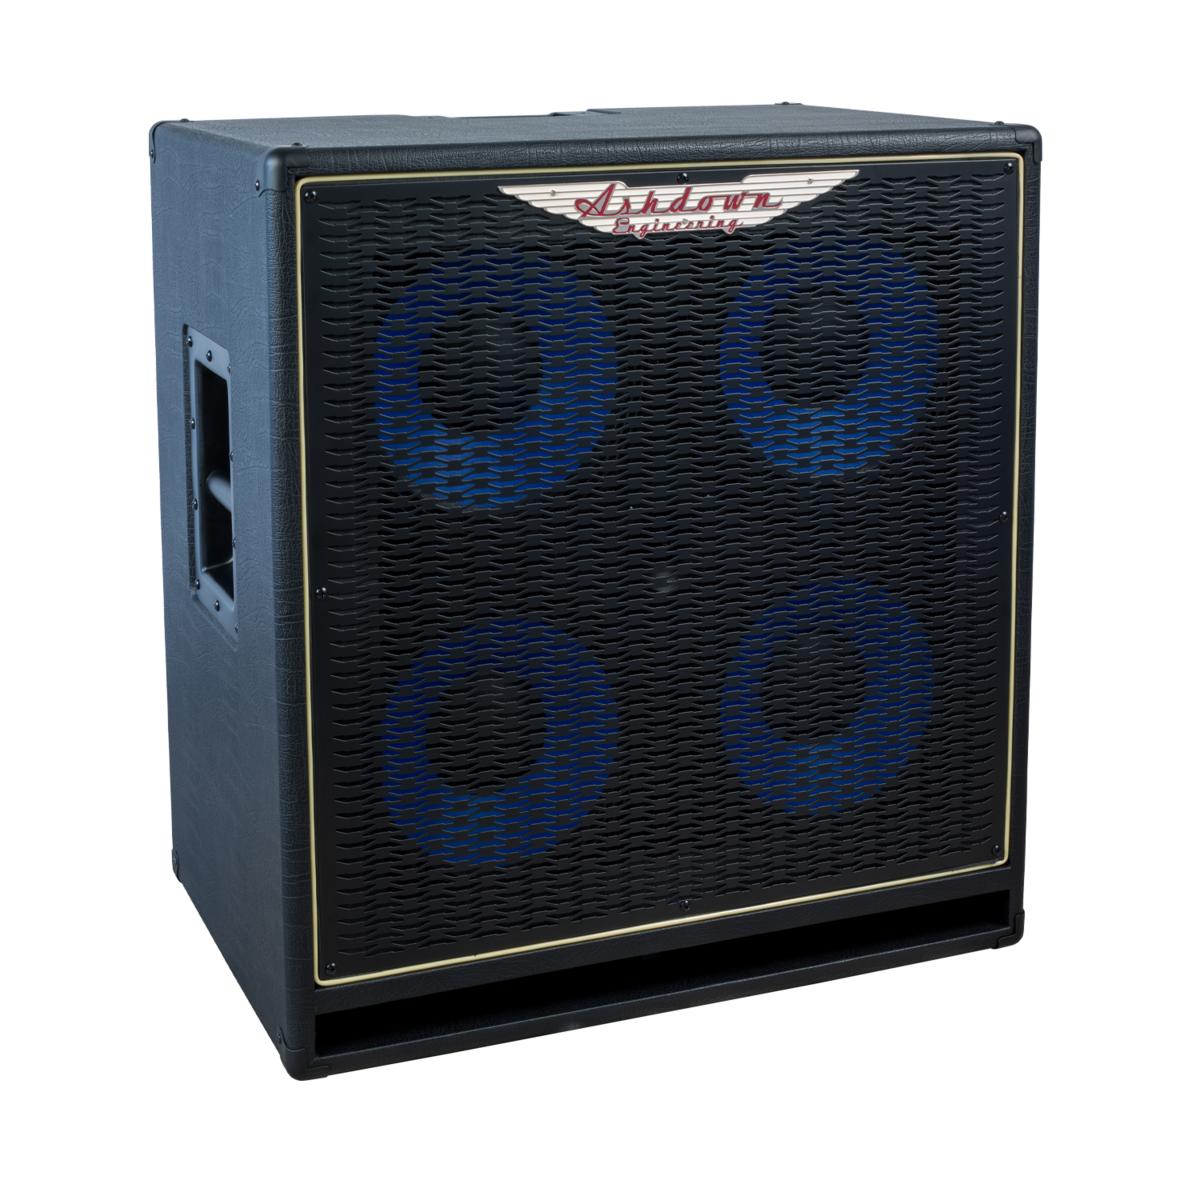 Ashdown AMB410 650W Bass Guitar Cabinet Blau Line Speakers Industry Standard